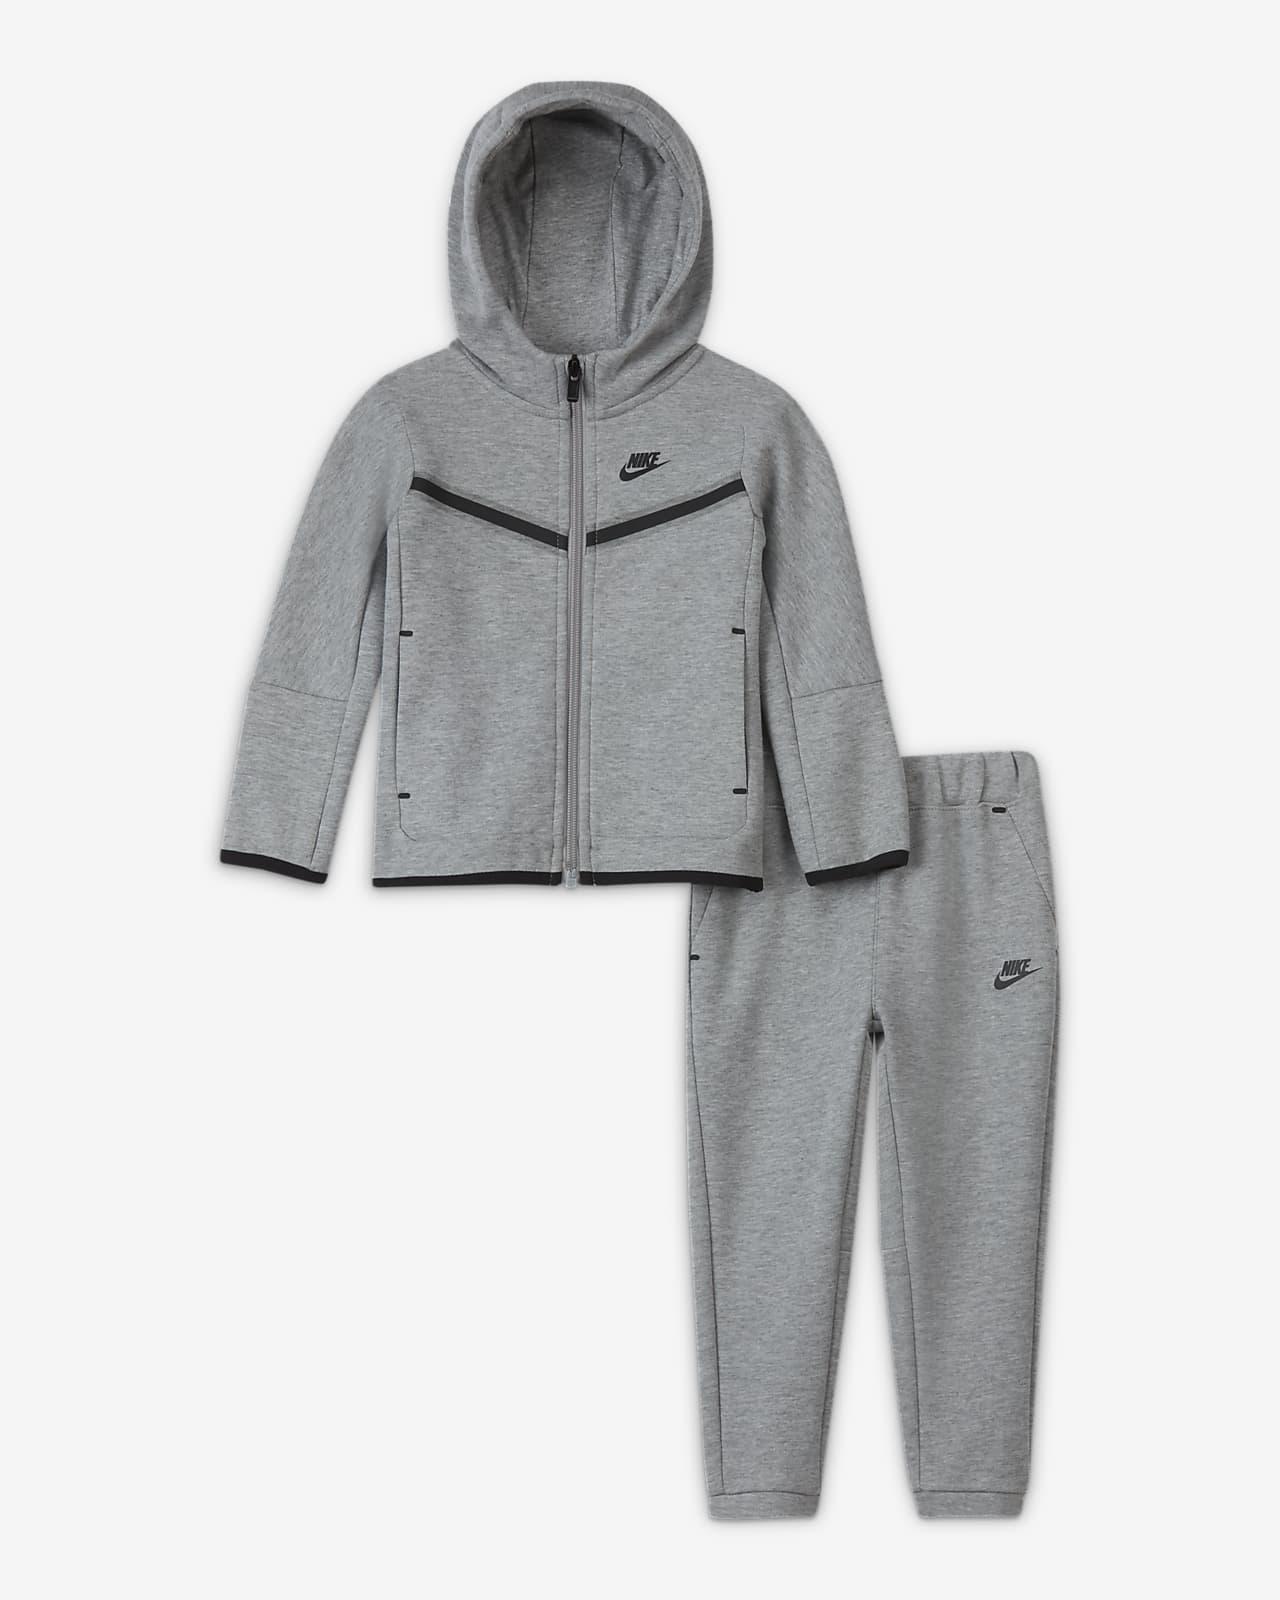 Nike Sportswear Tech Fleece Baby (12-24M) Zip Hoodie and Pants Set